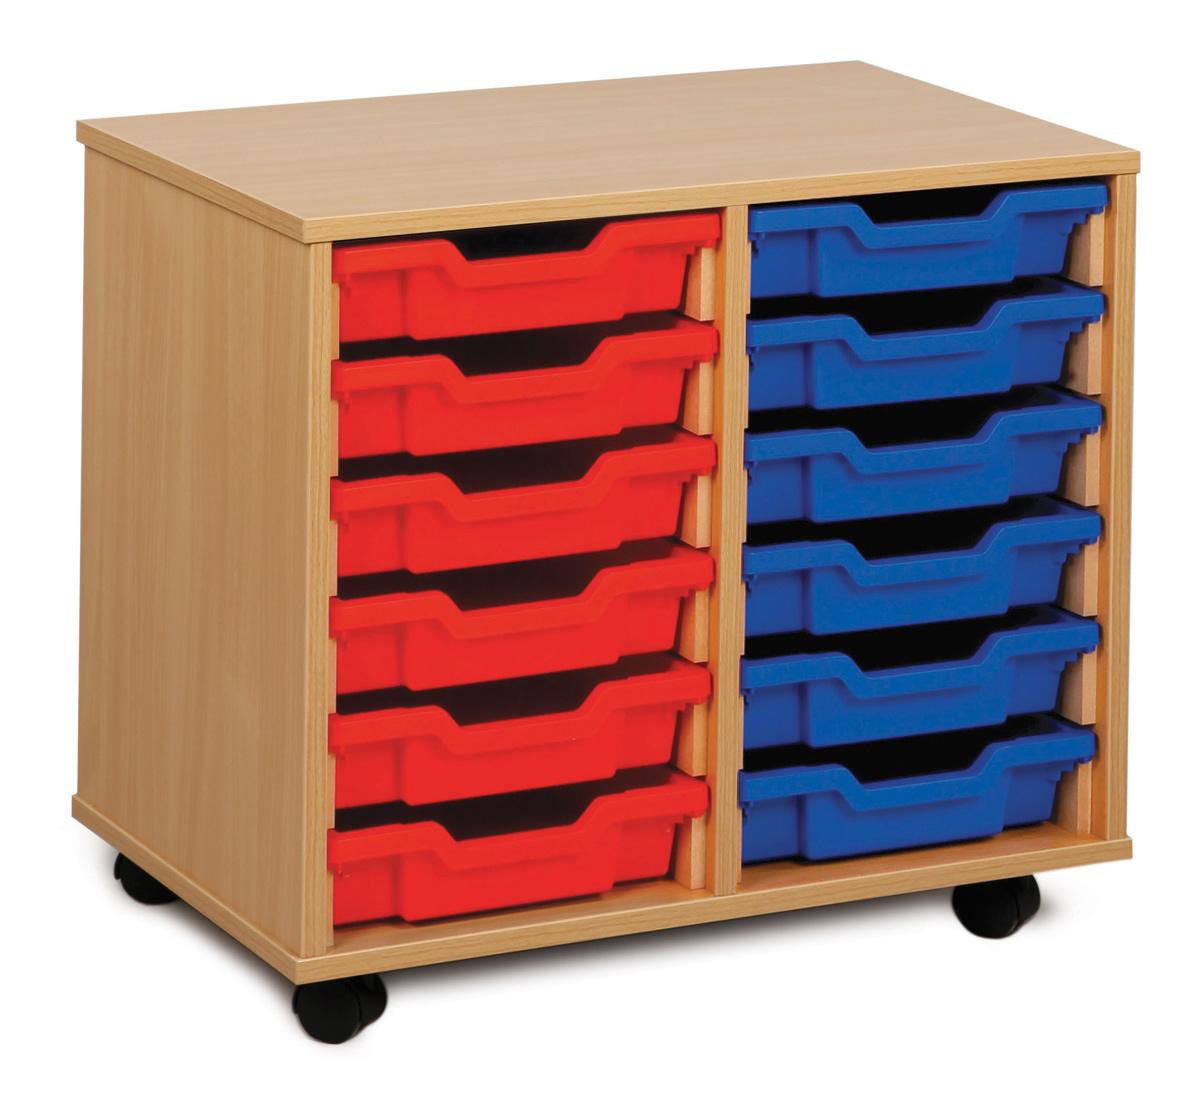 School Storage 12 Shallow Tray Unit Inc Trays Castors Office Canteen School Boardroom